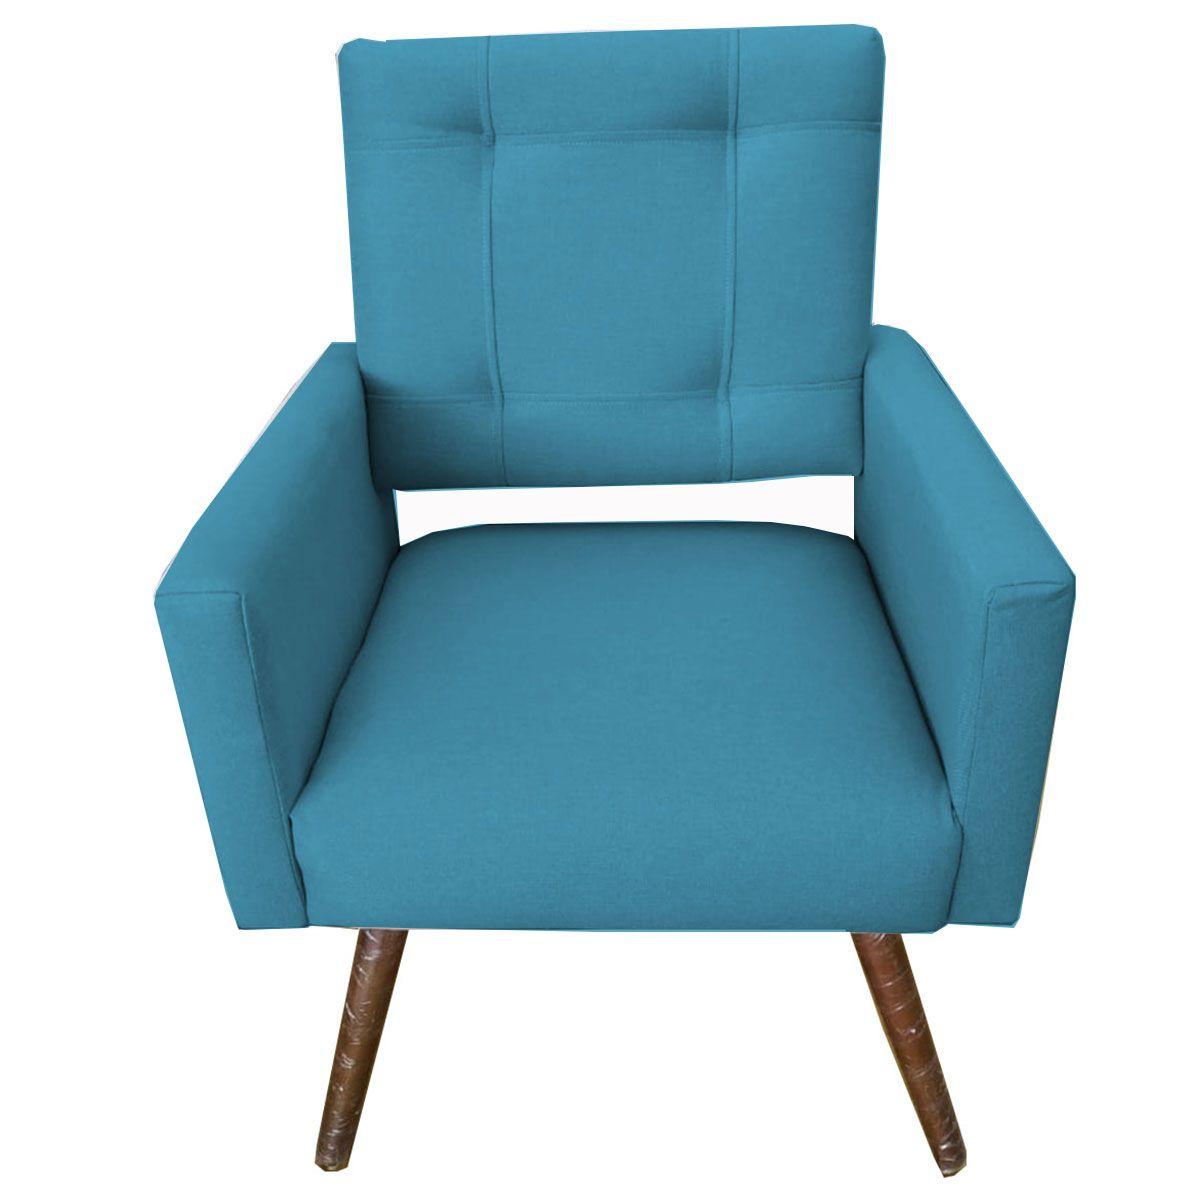 Poltrona Decorativa Isabela Pé Palito Tecido Azul Turquesa